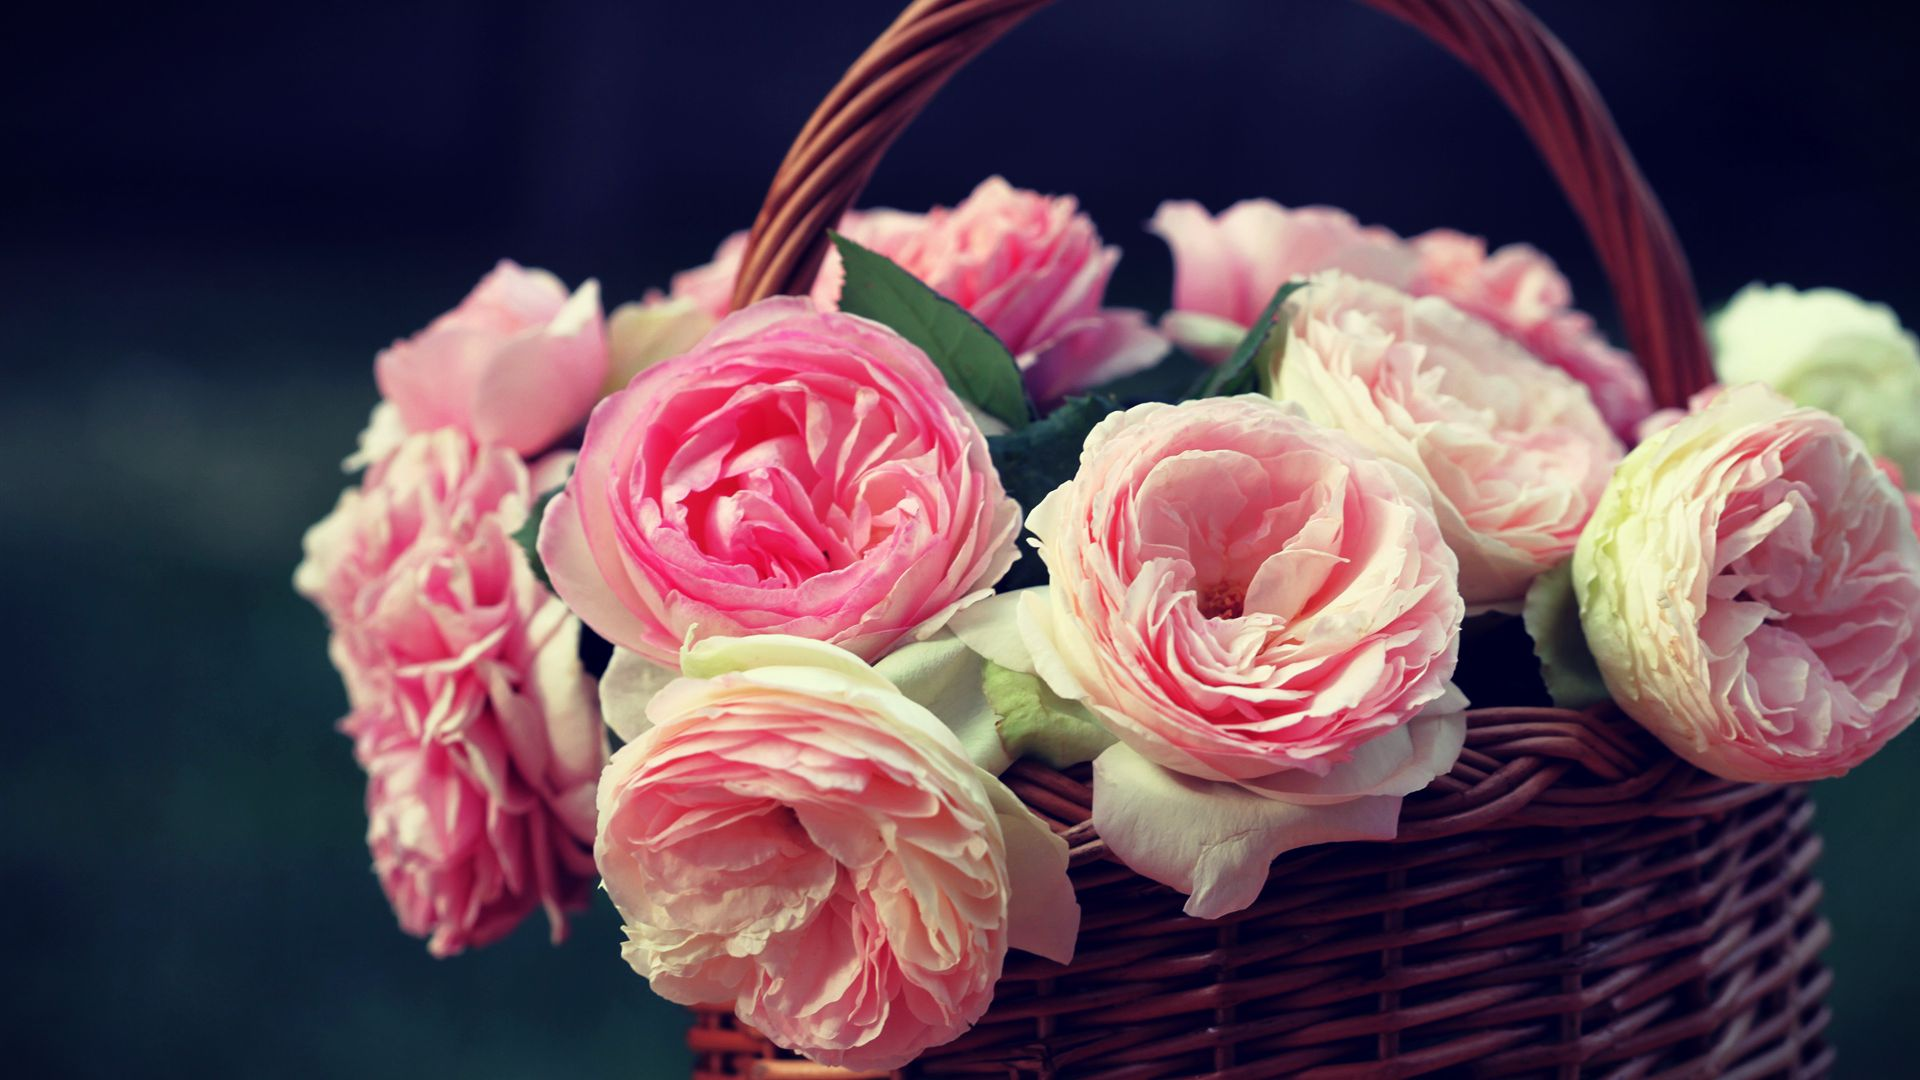 cute pink roses wallpaper 23392 1920x1080 px. Black Bedroom Furniture Sets. Home Design Ideas